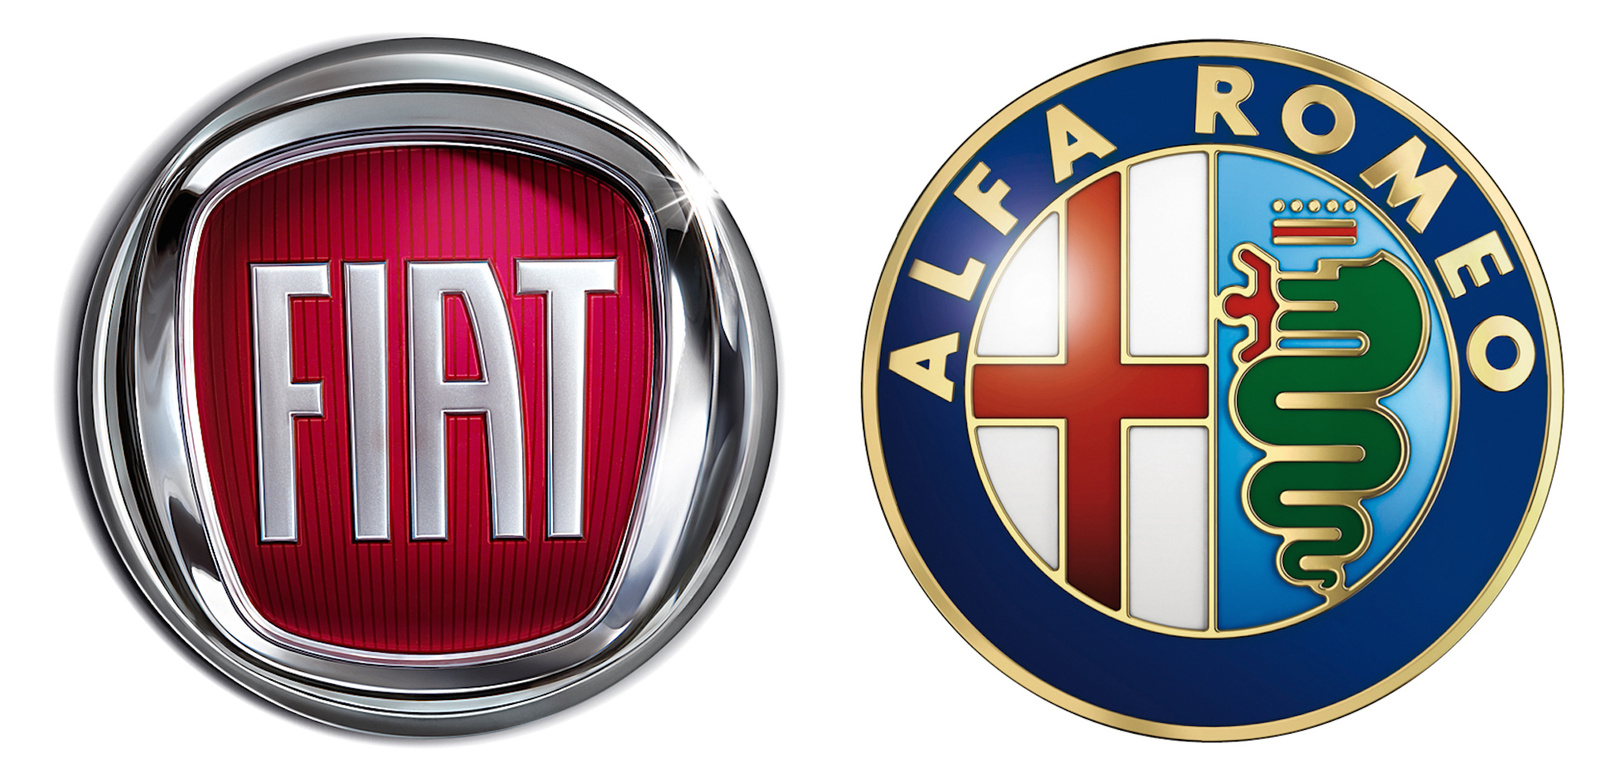 Alfa Romeo And Fiat Of San Diego San Diego Ca Read